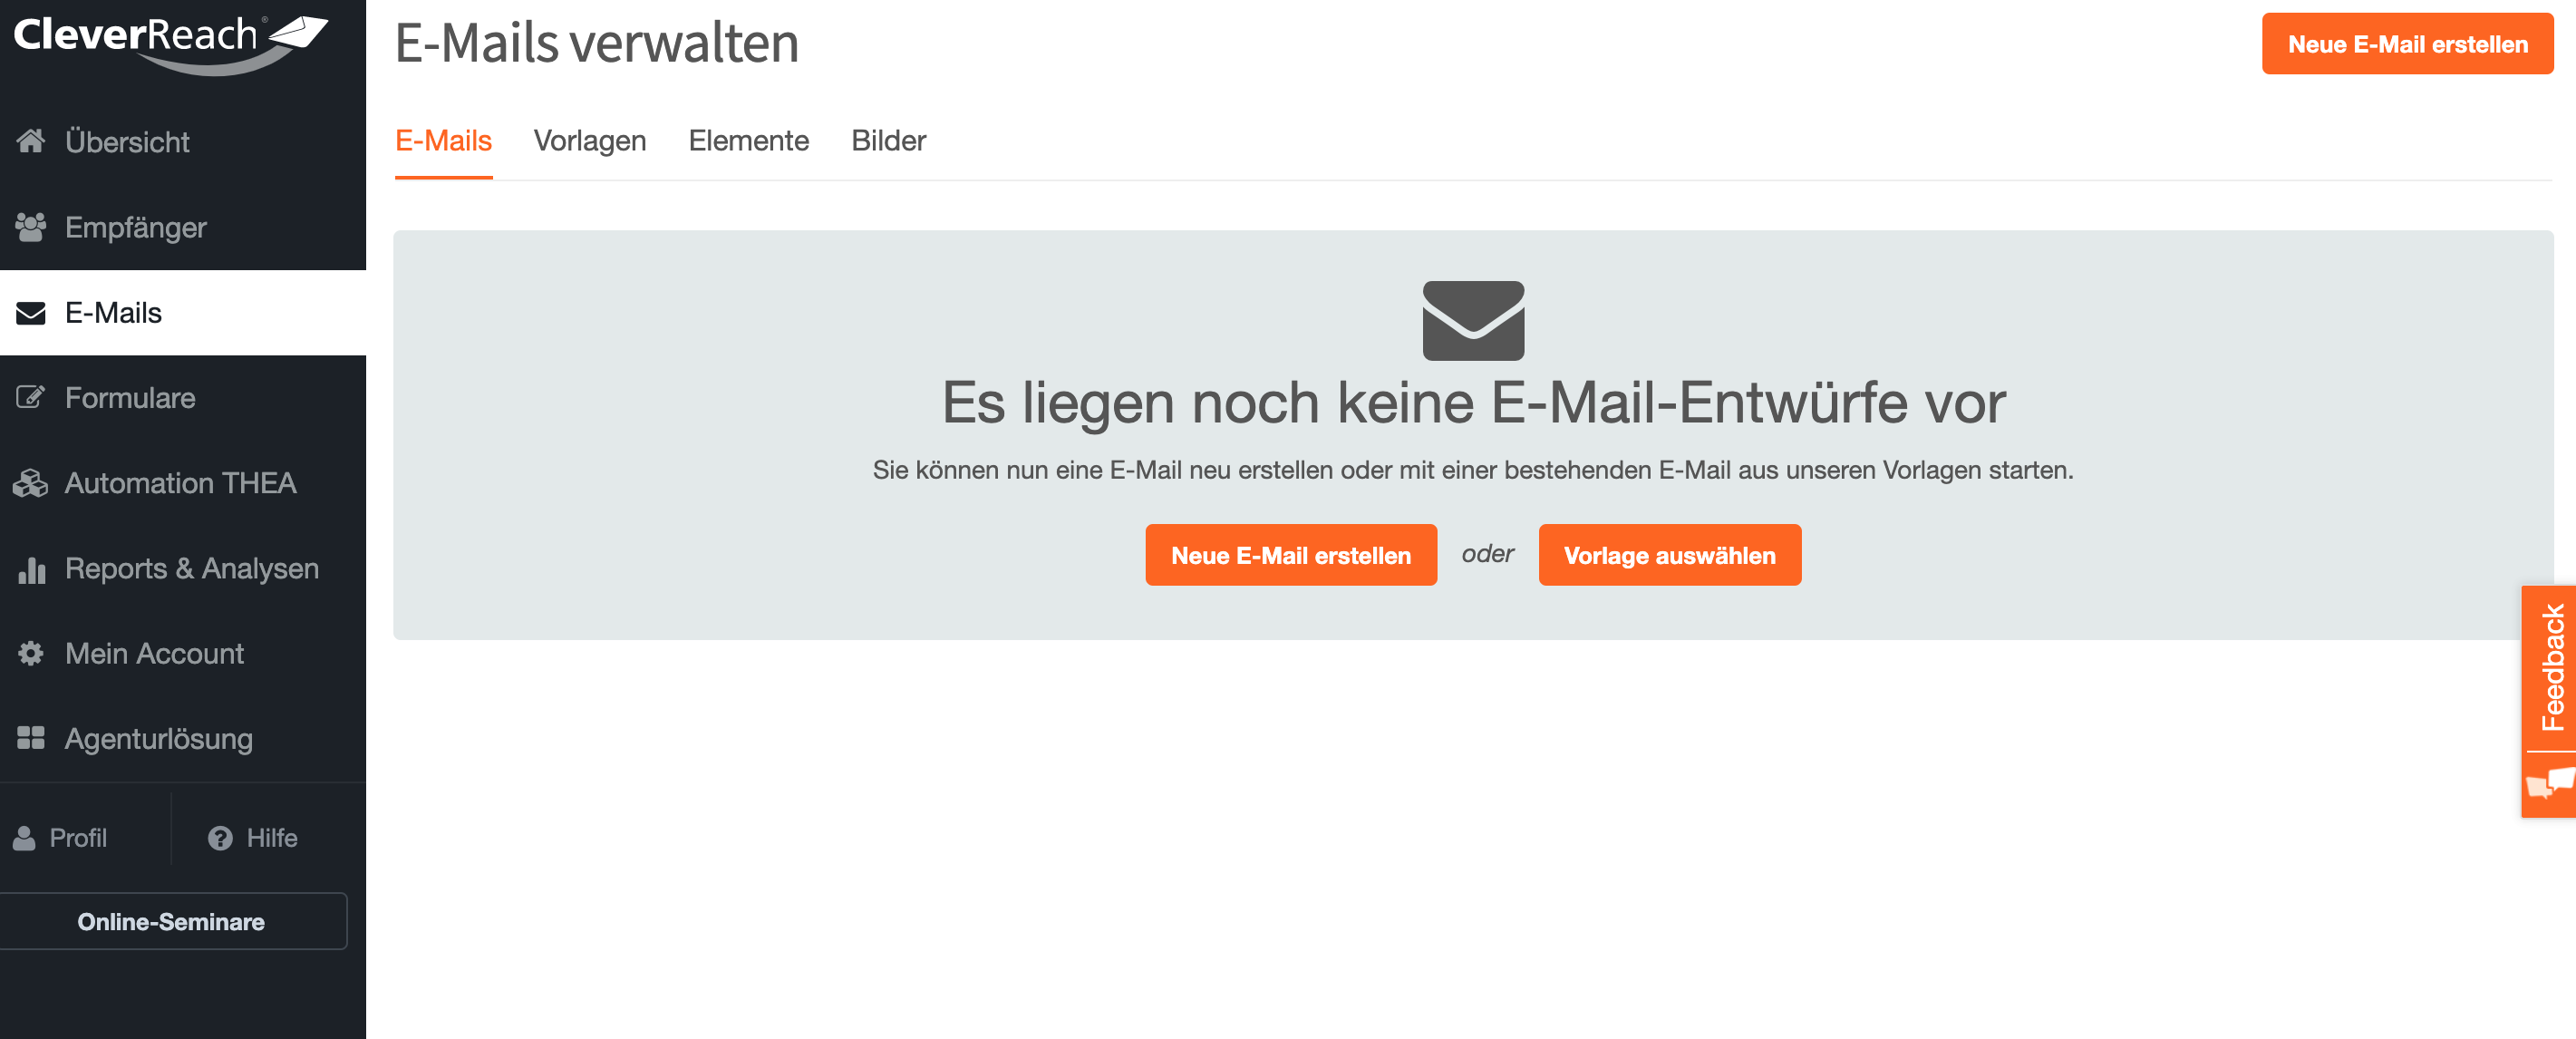 Template Converter - Übersicht E-Mails CleverReach